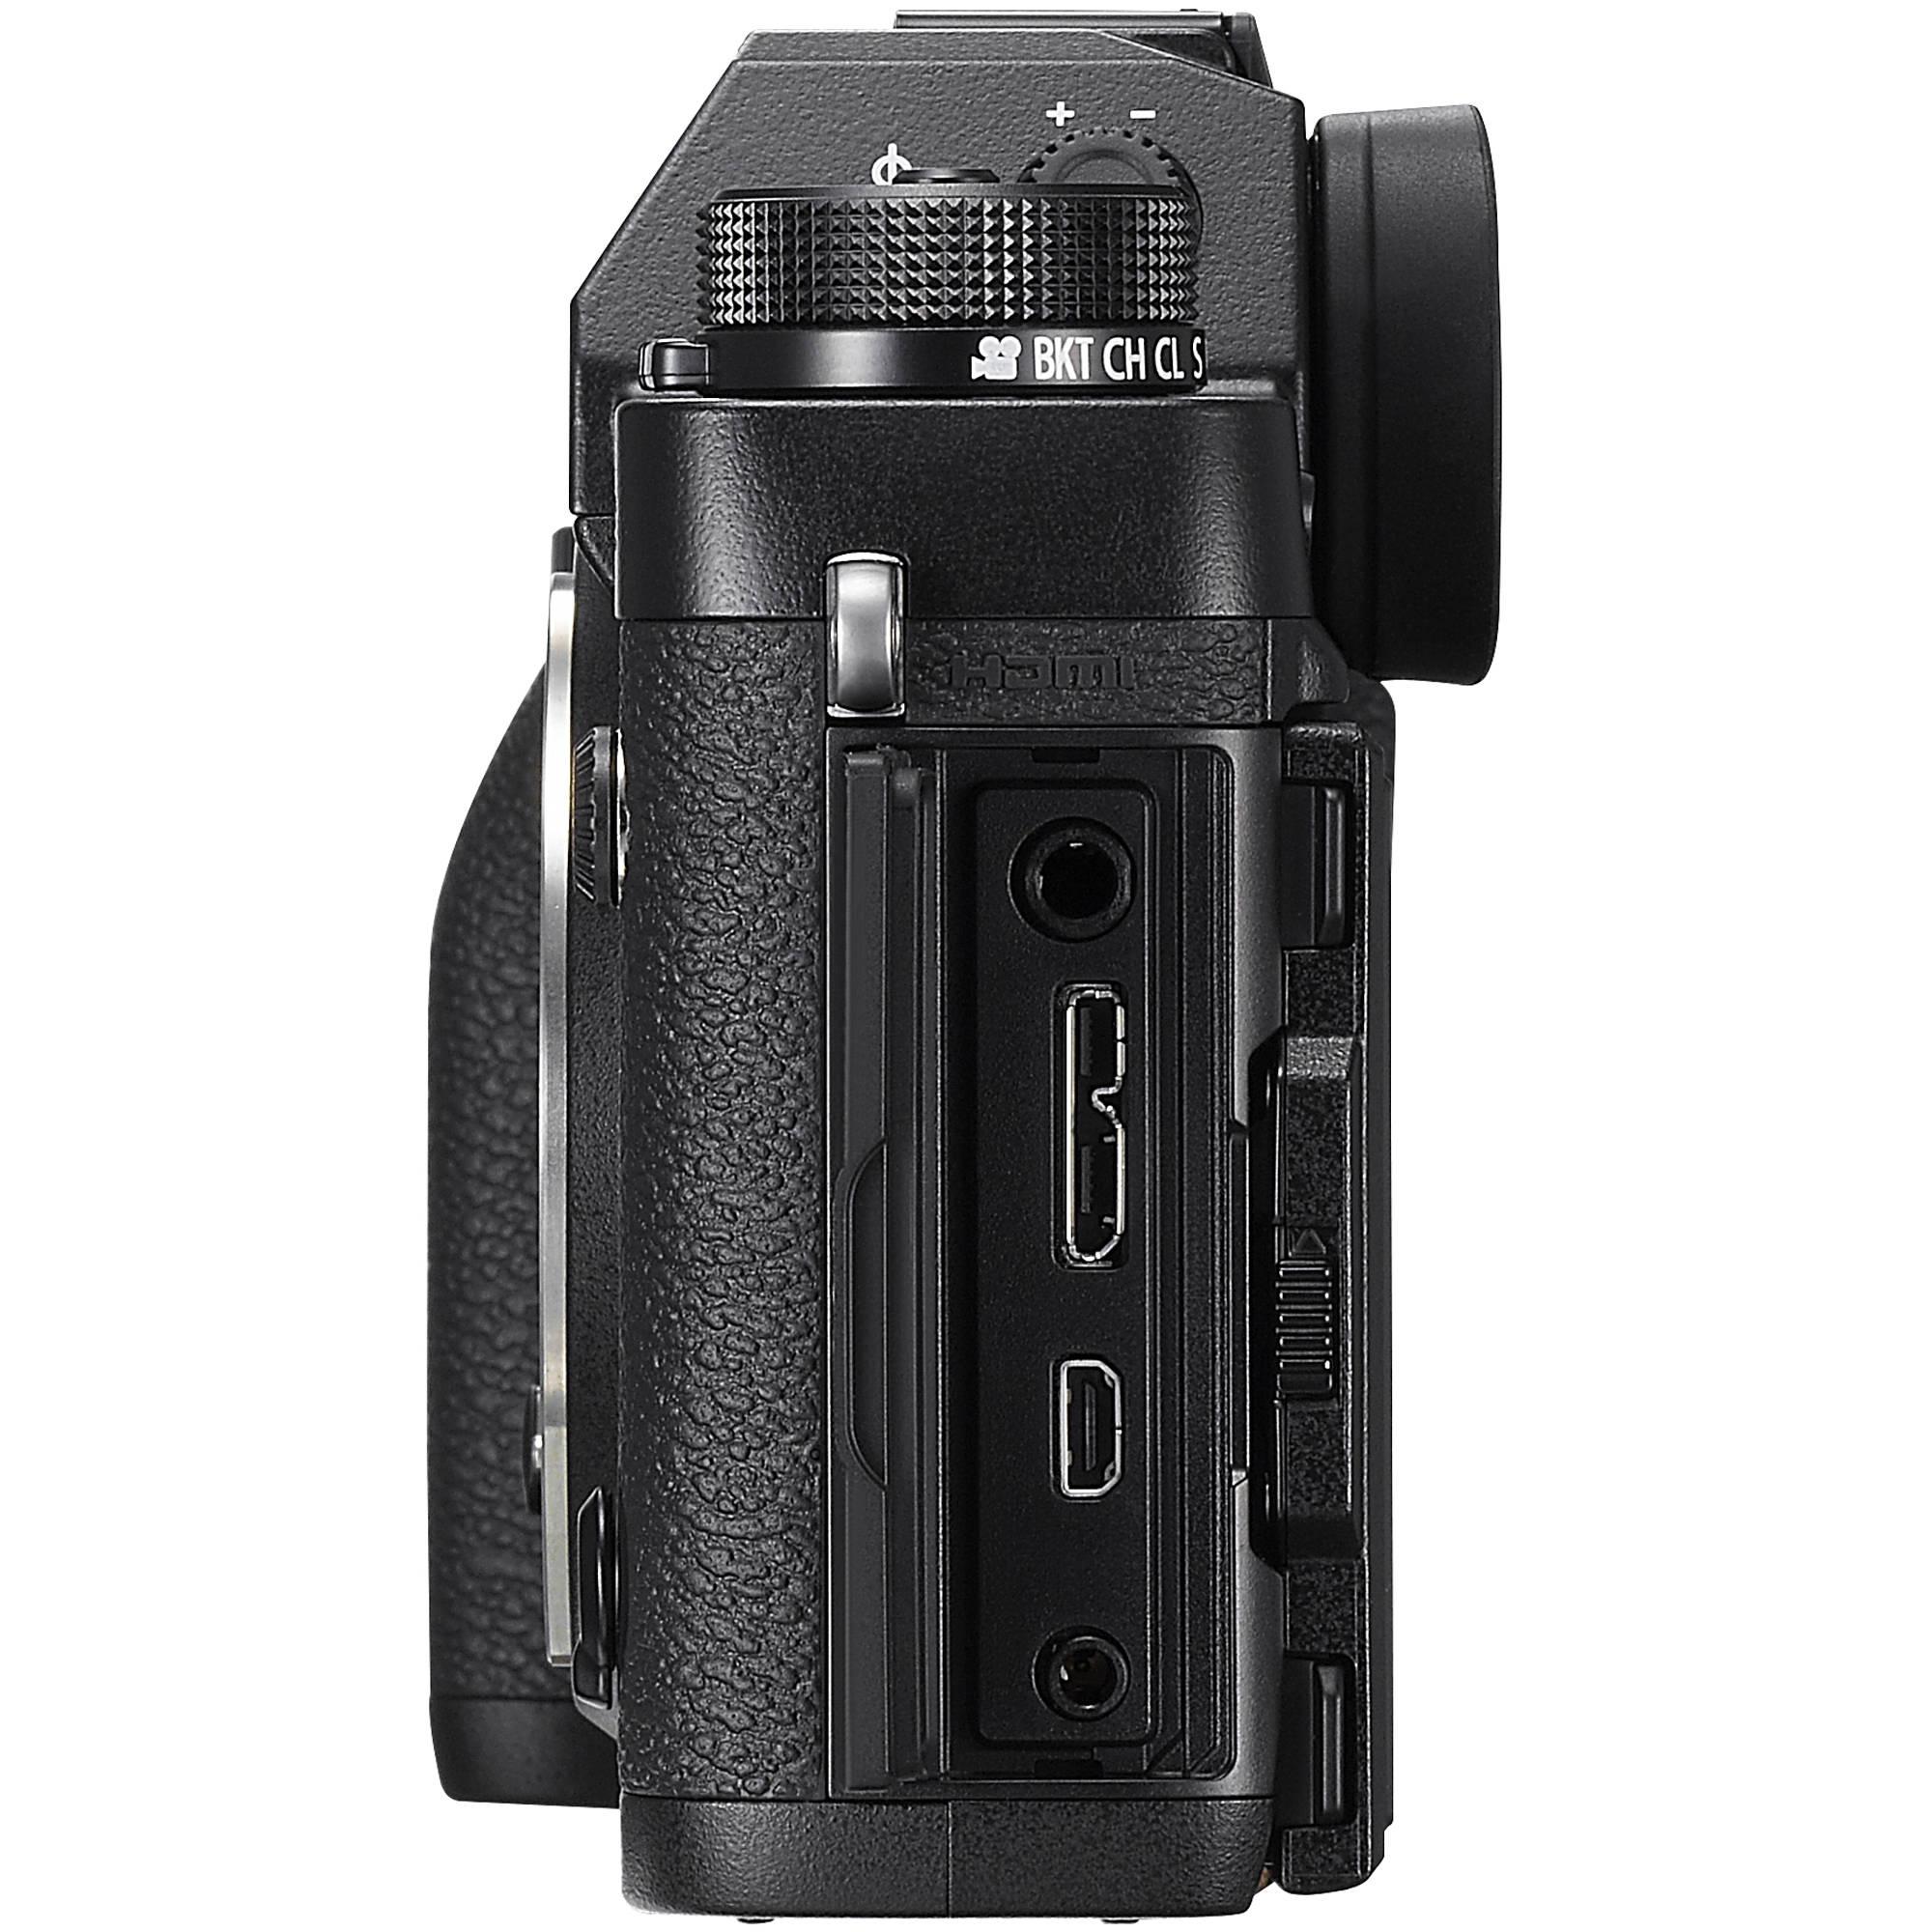 FujiFilm X-T2 Compact System Camera Body Only (Black) | Online Camera Store Australia | Camera-Warehouse.com.au